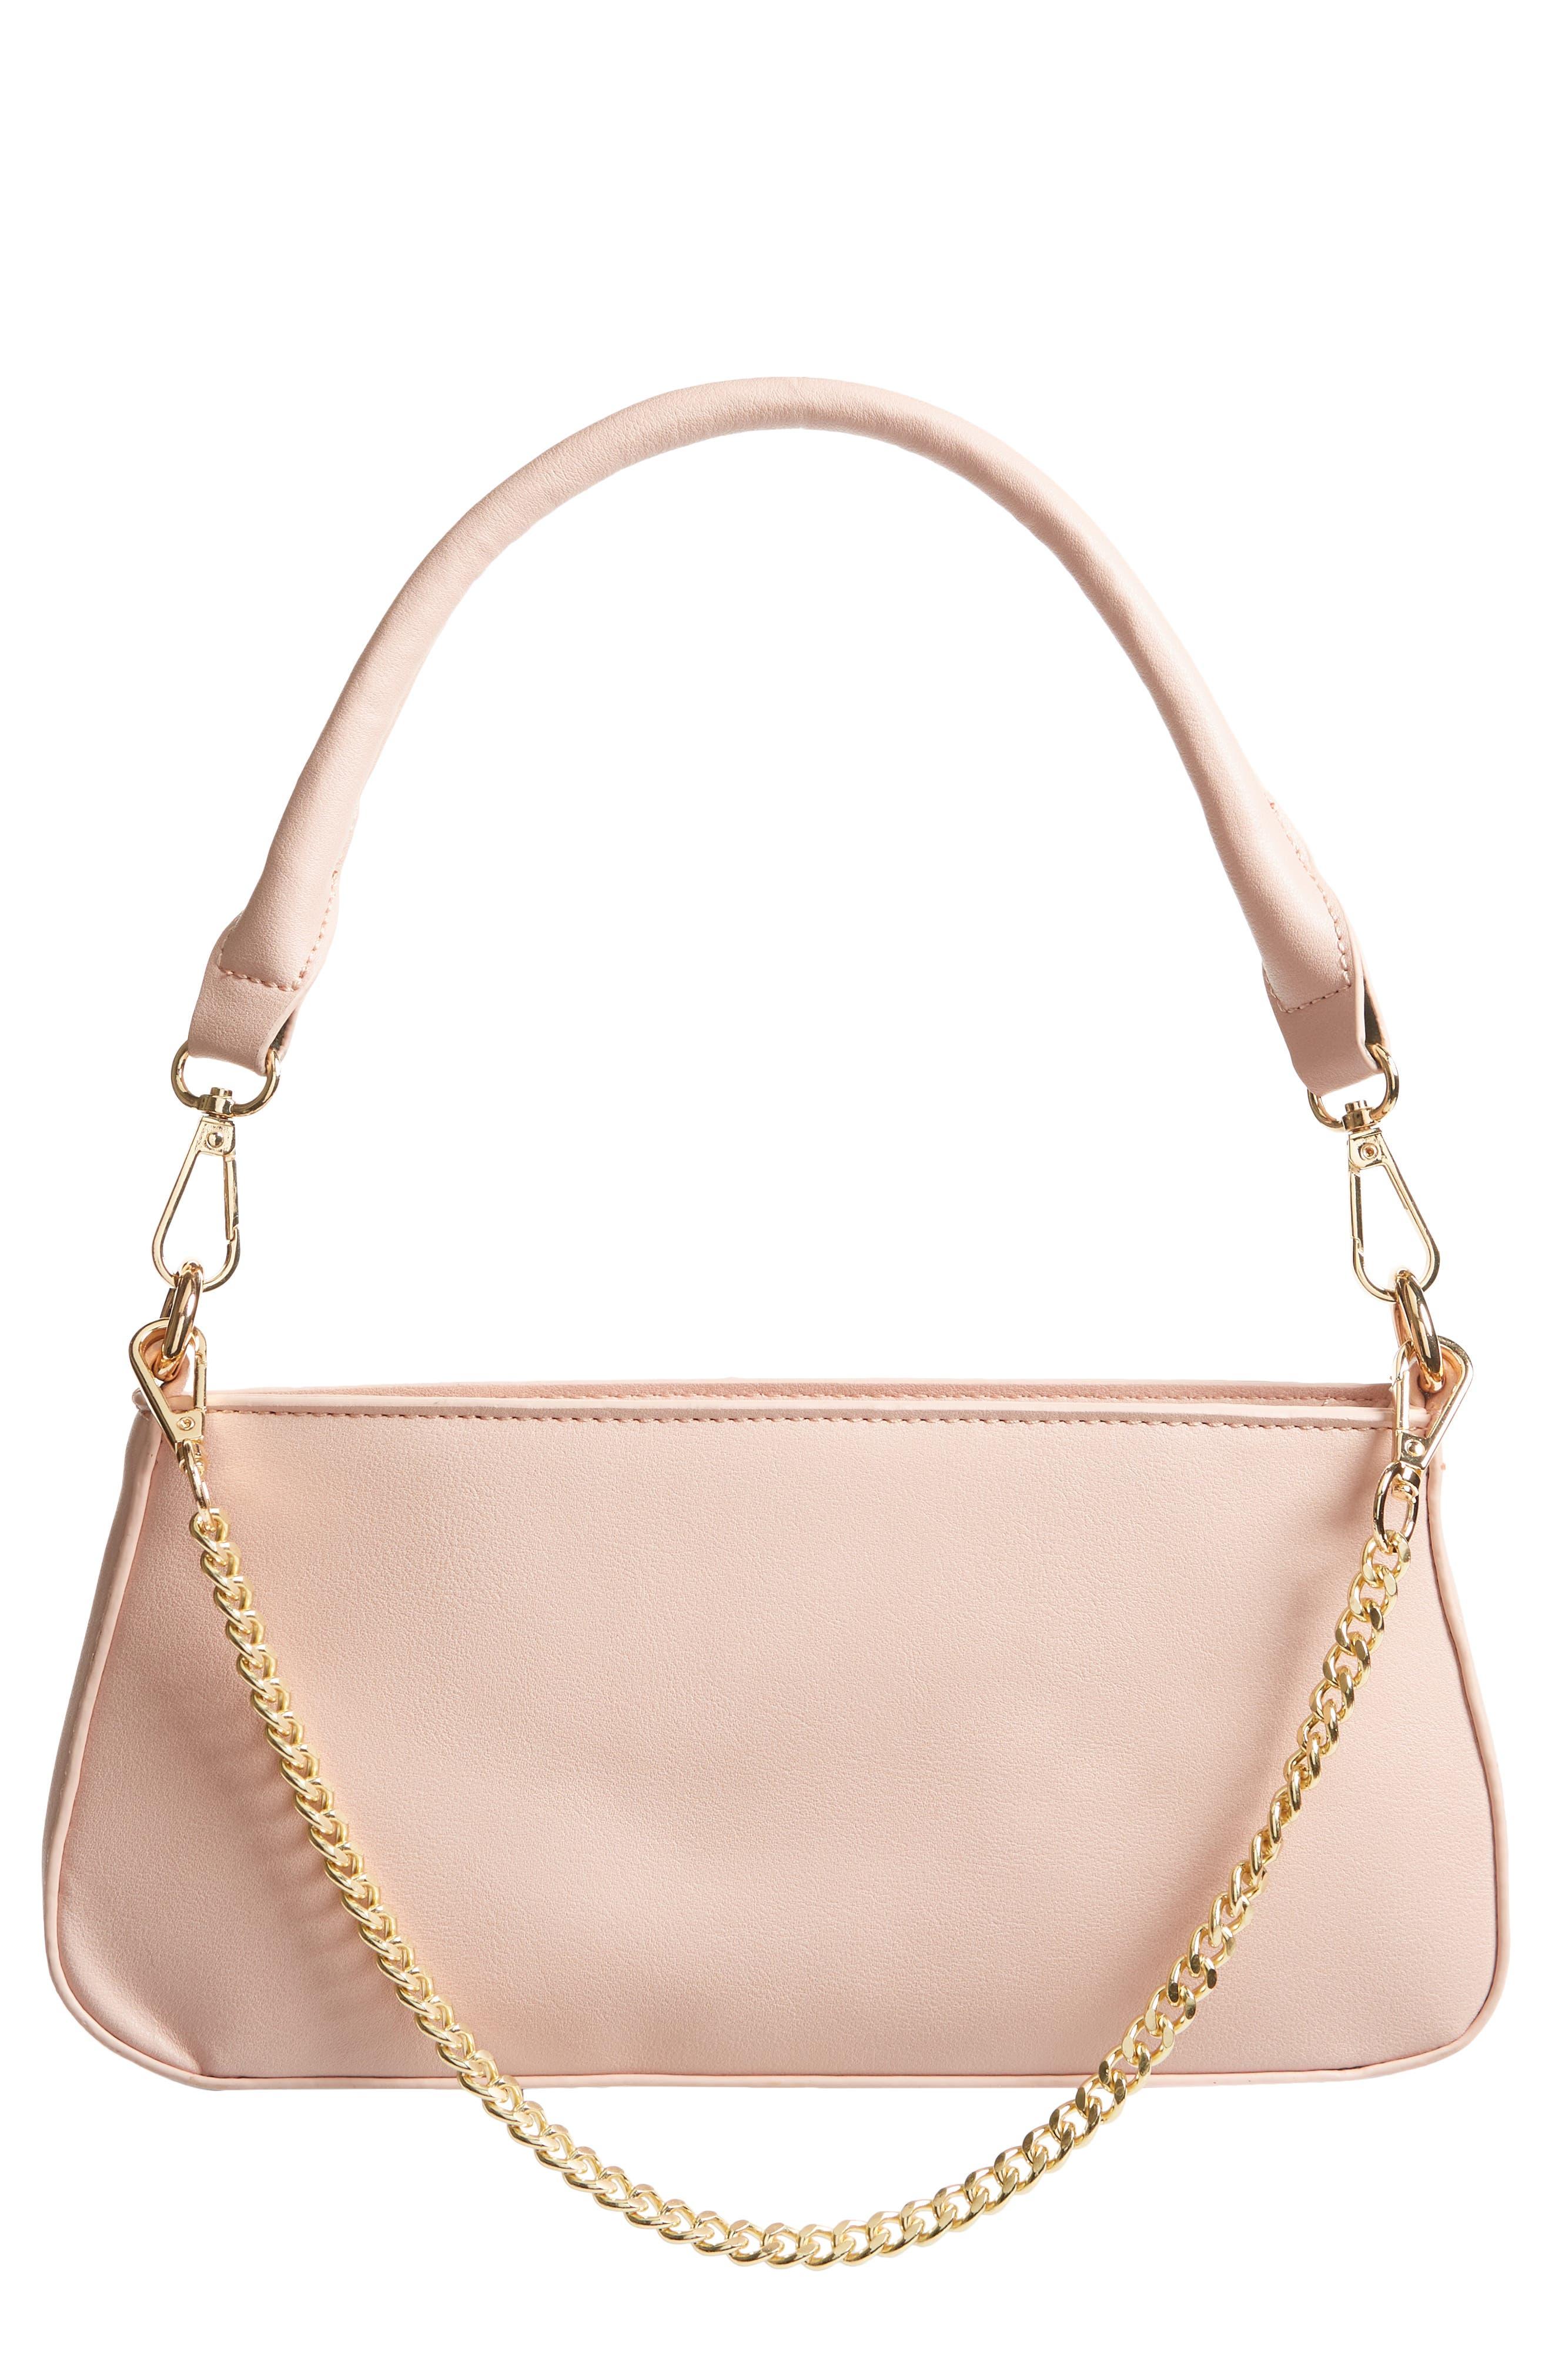 Mali + Lili Classic Vegan Leather Baguette Bag